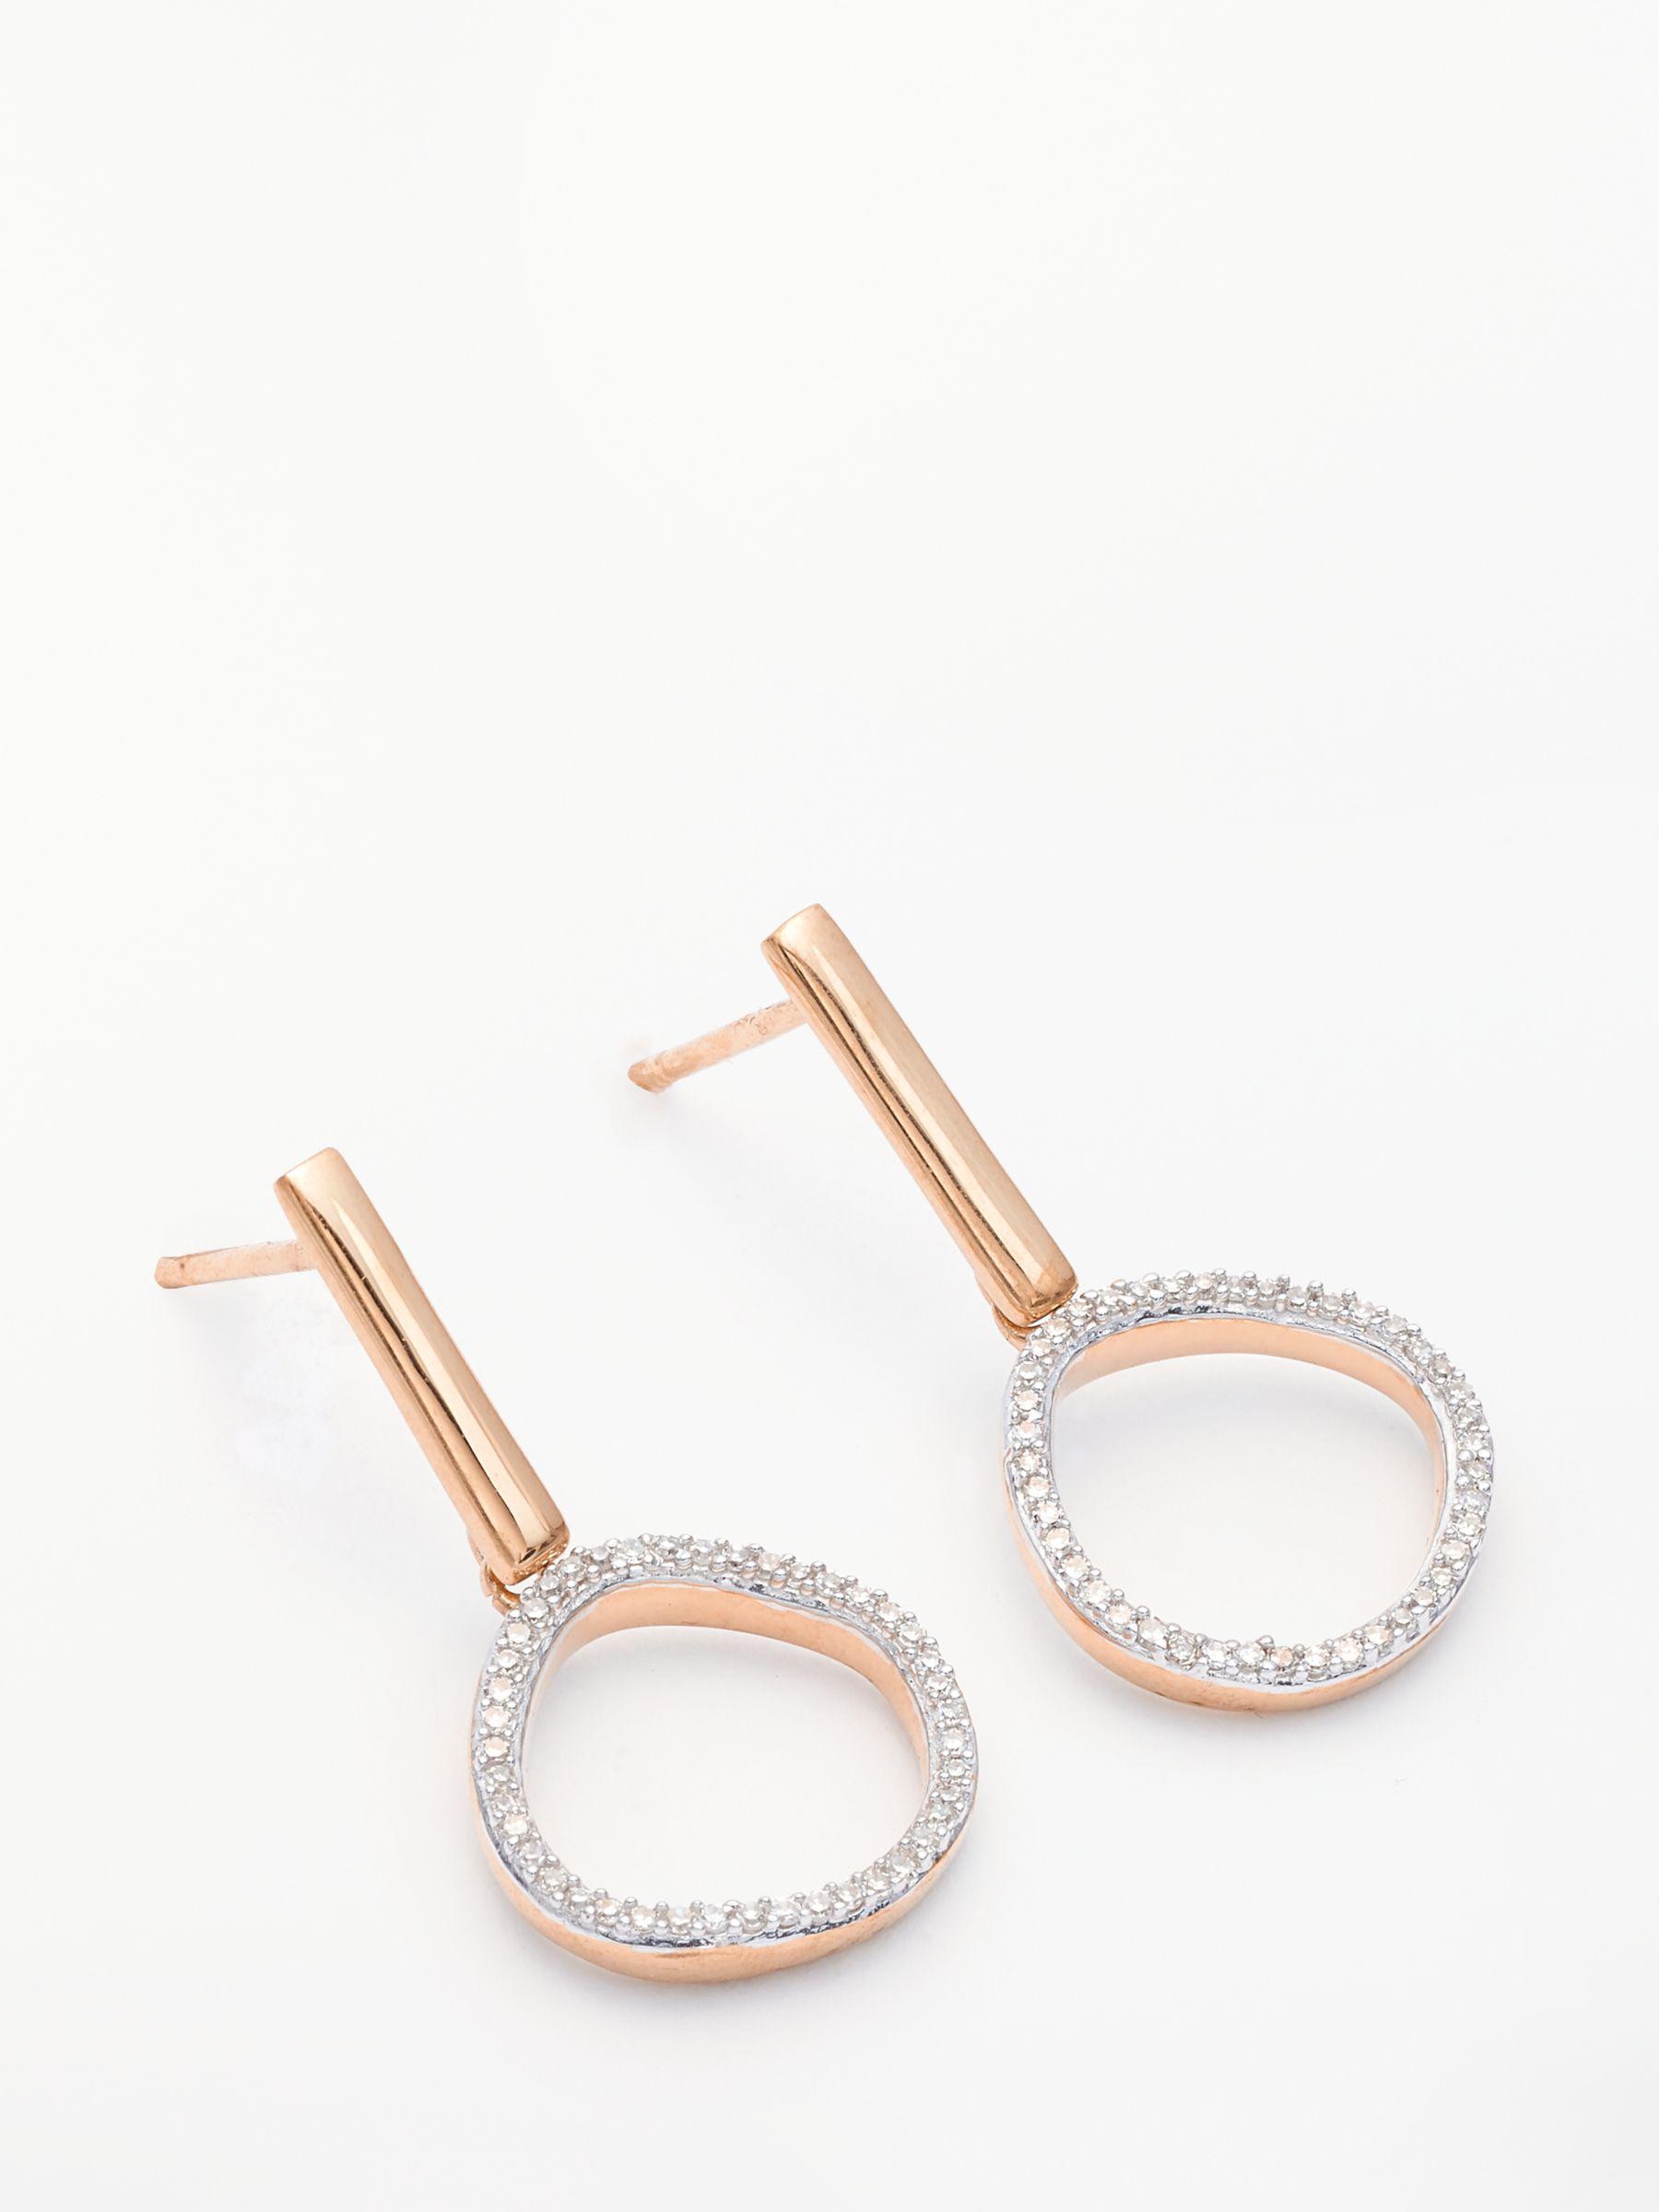 ef260c3f2b90 Modern Rarity. Women's Metallic Diamond Open Circle Drop Earrings. £220  From John Lewis and Partners